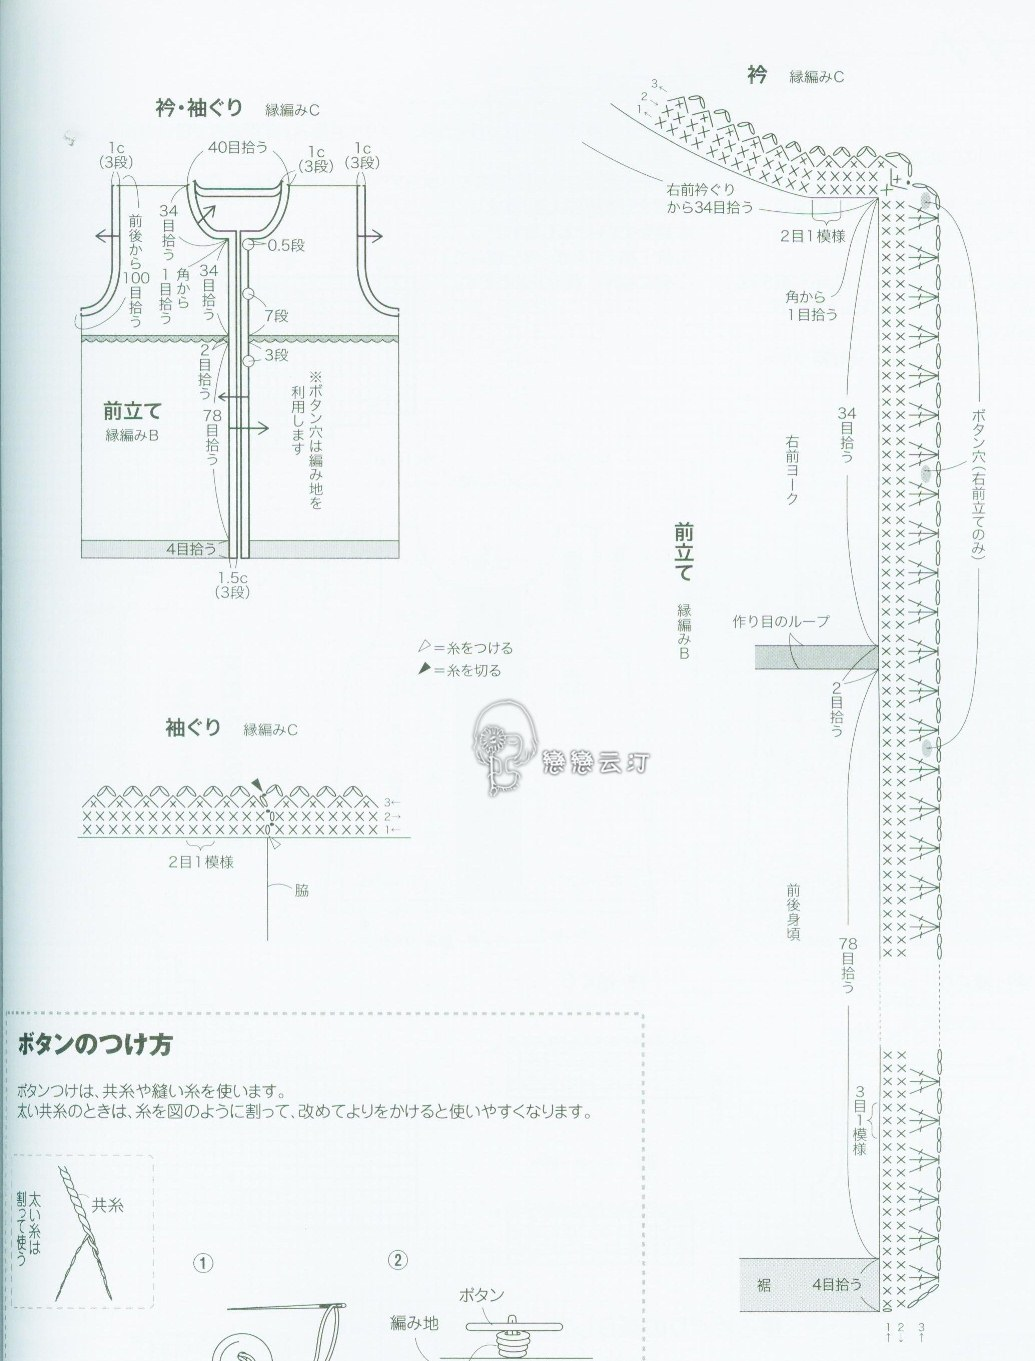 0753_no4037 (15)